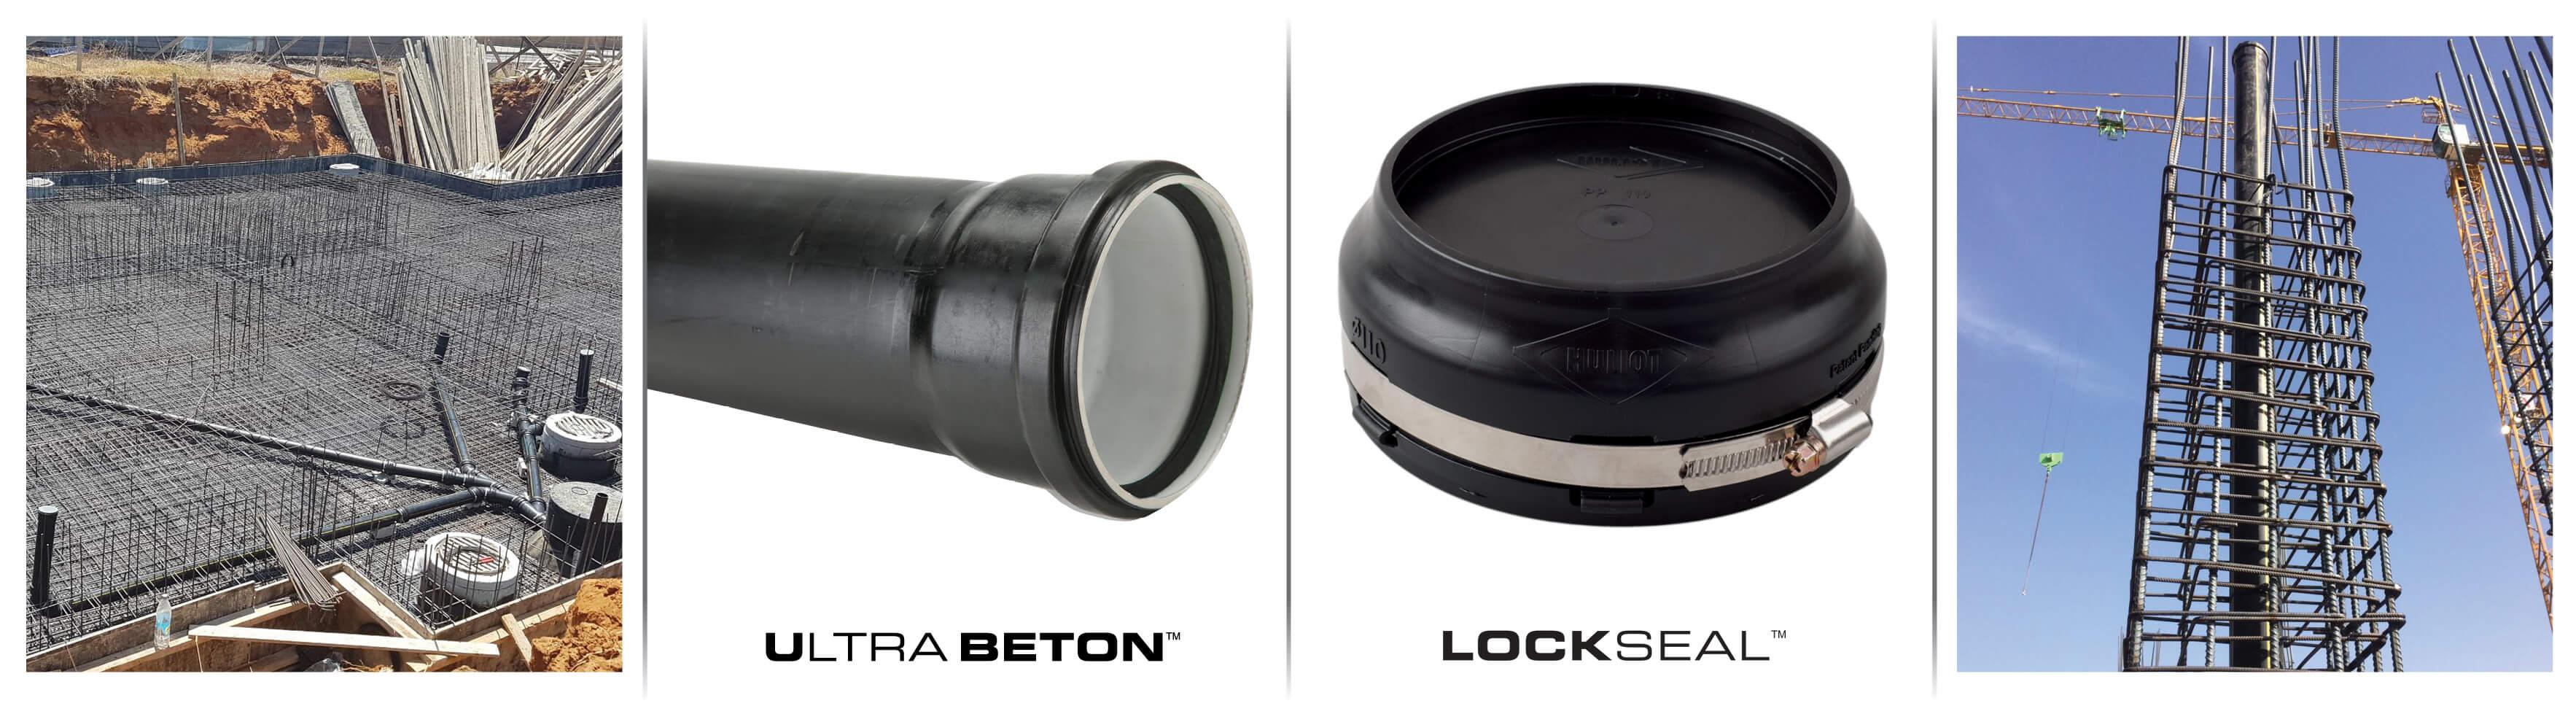 ULTRA BETON™